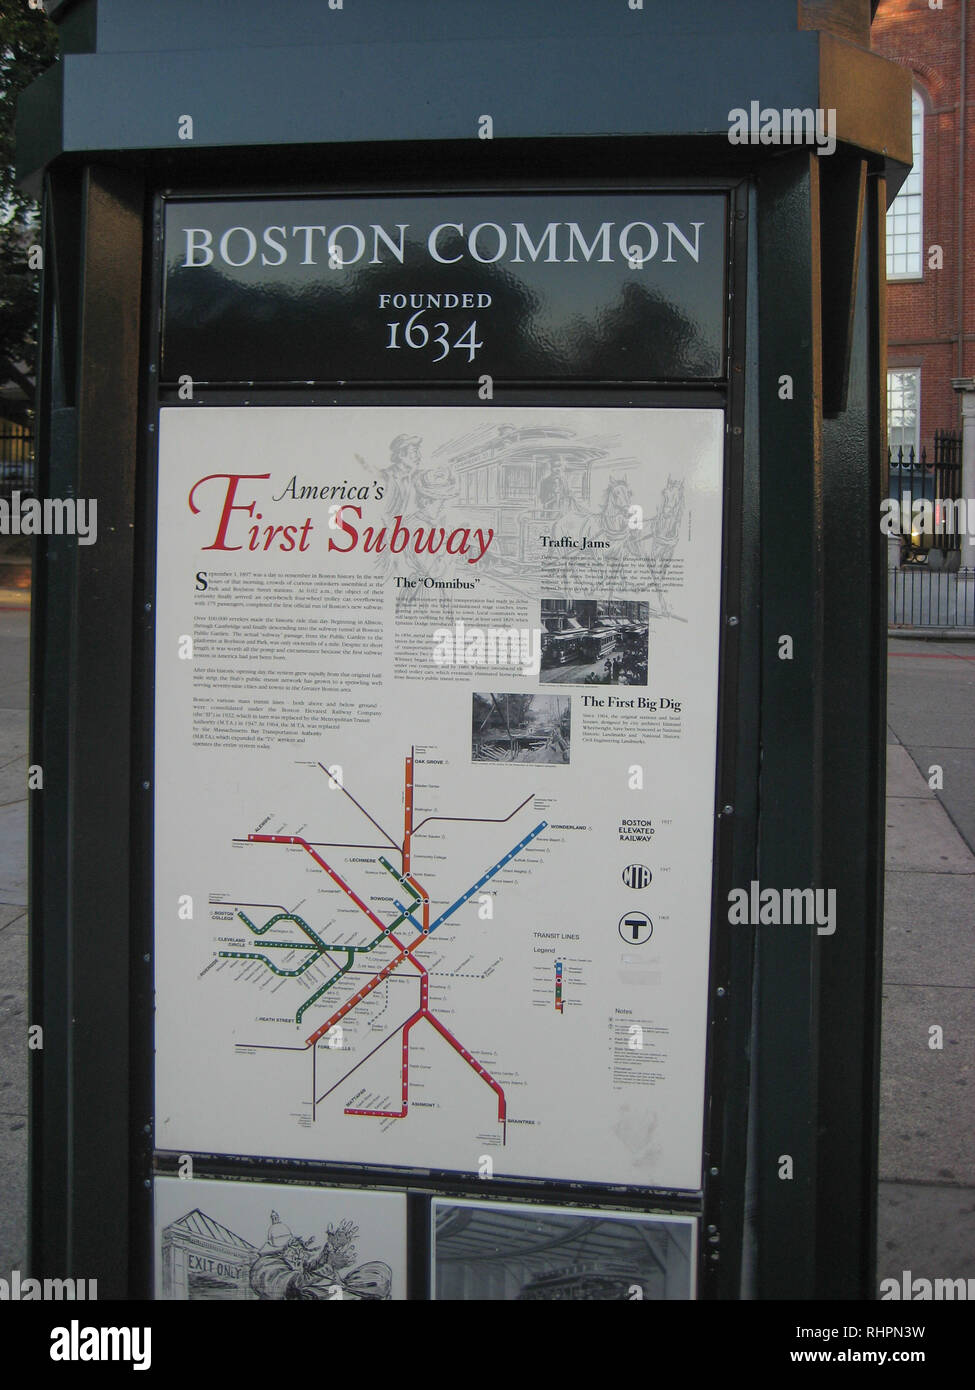 Massachusetts Subway Map.Boston Common Subway Map And Sign Boston Massachusetts Usa Stock